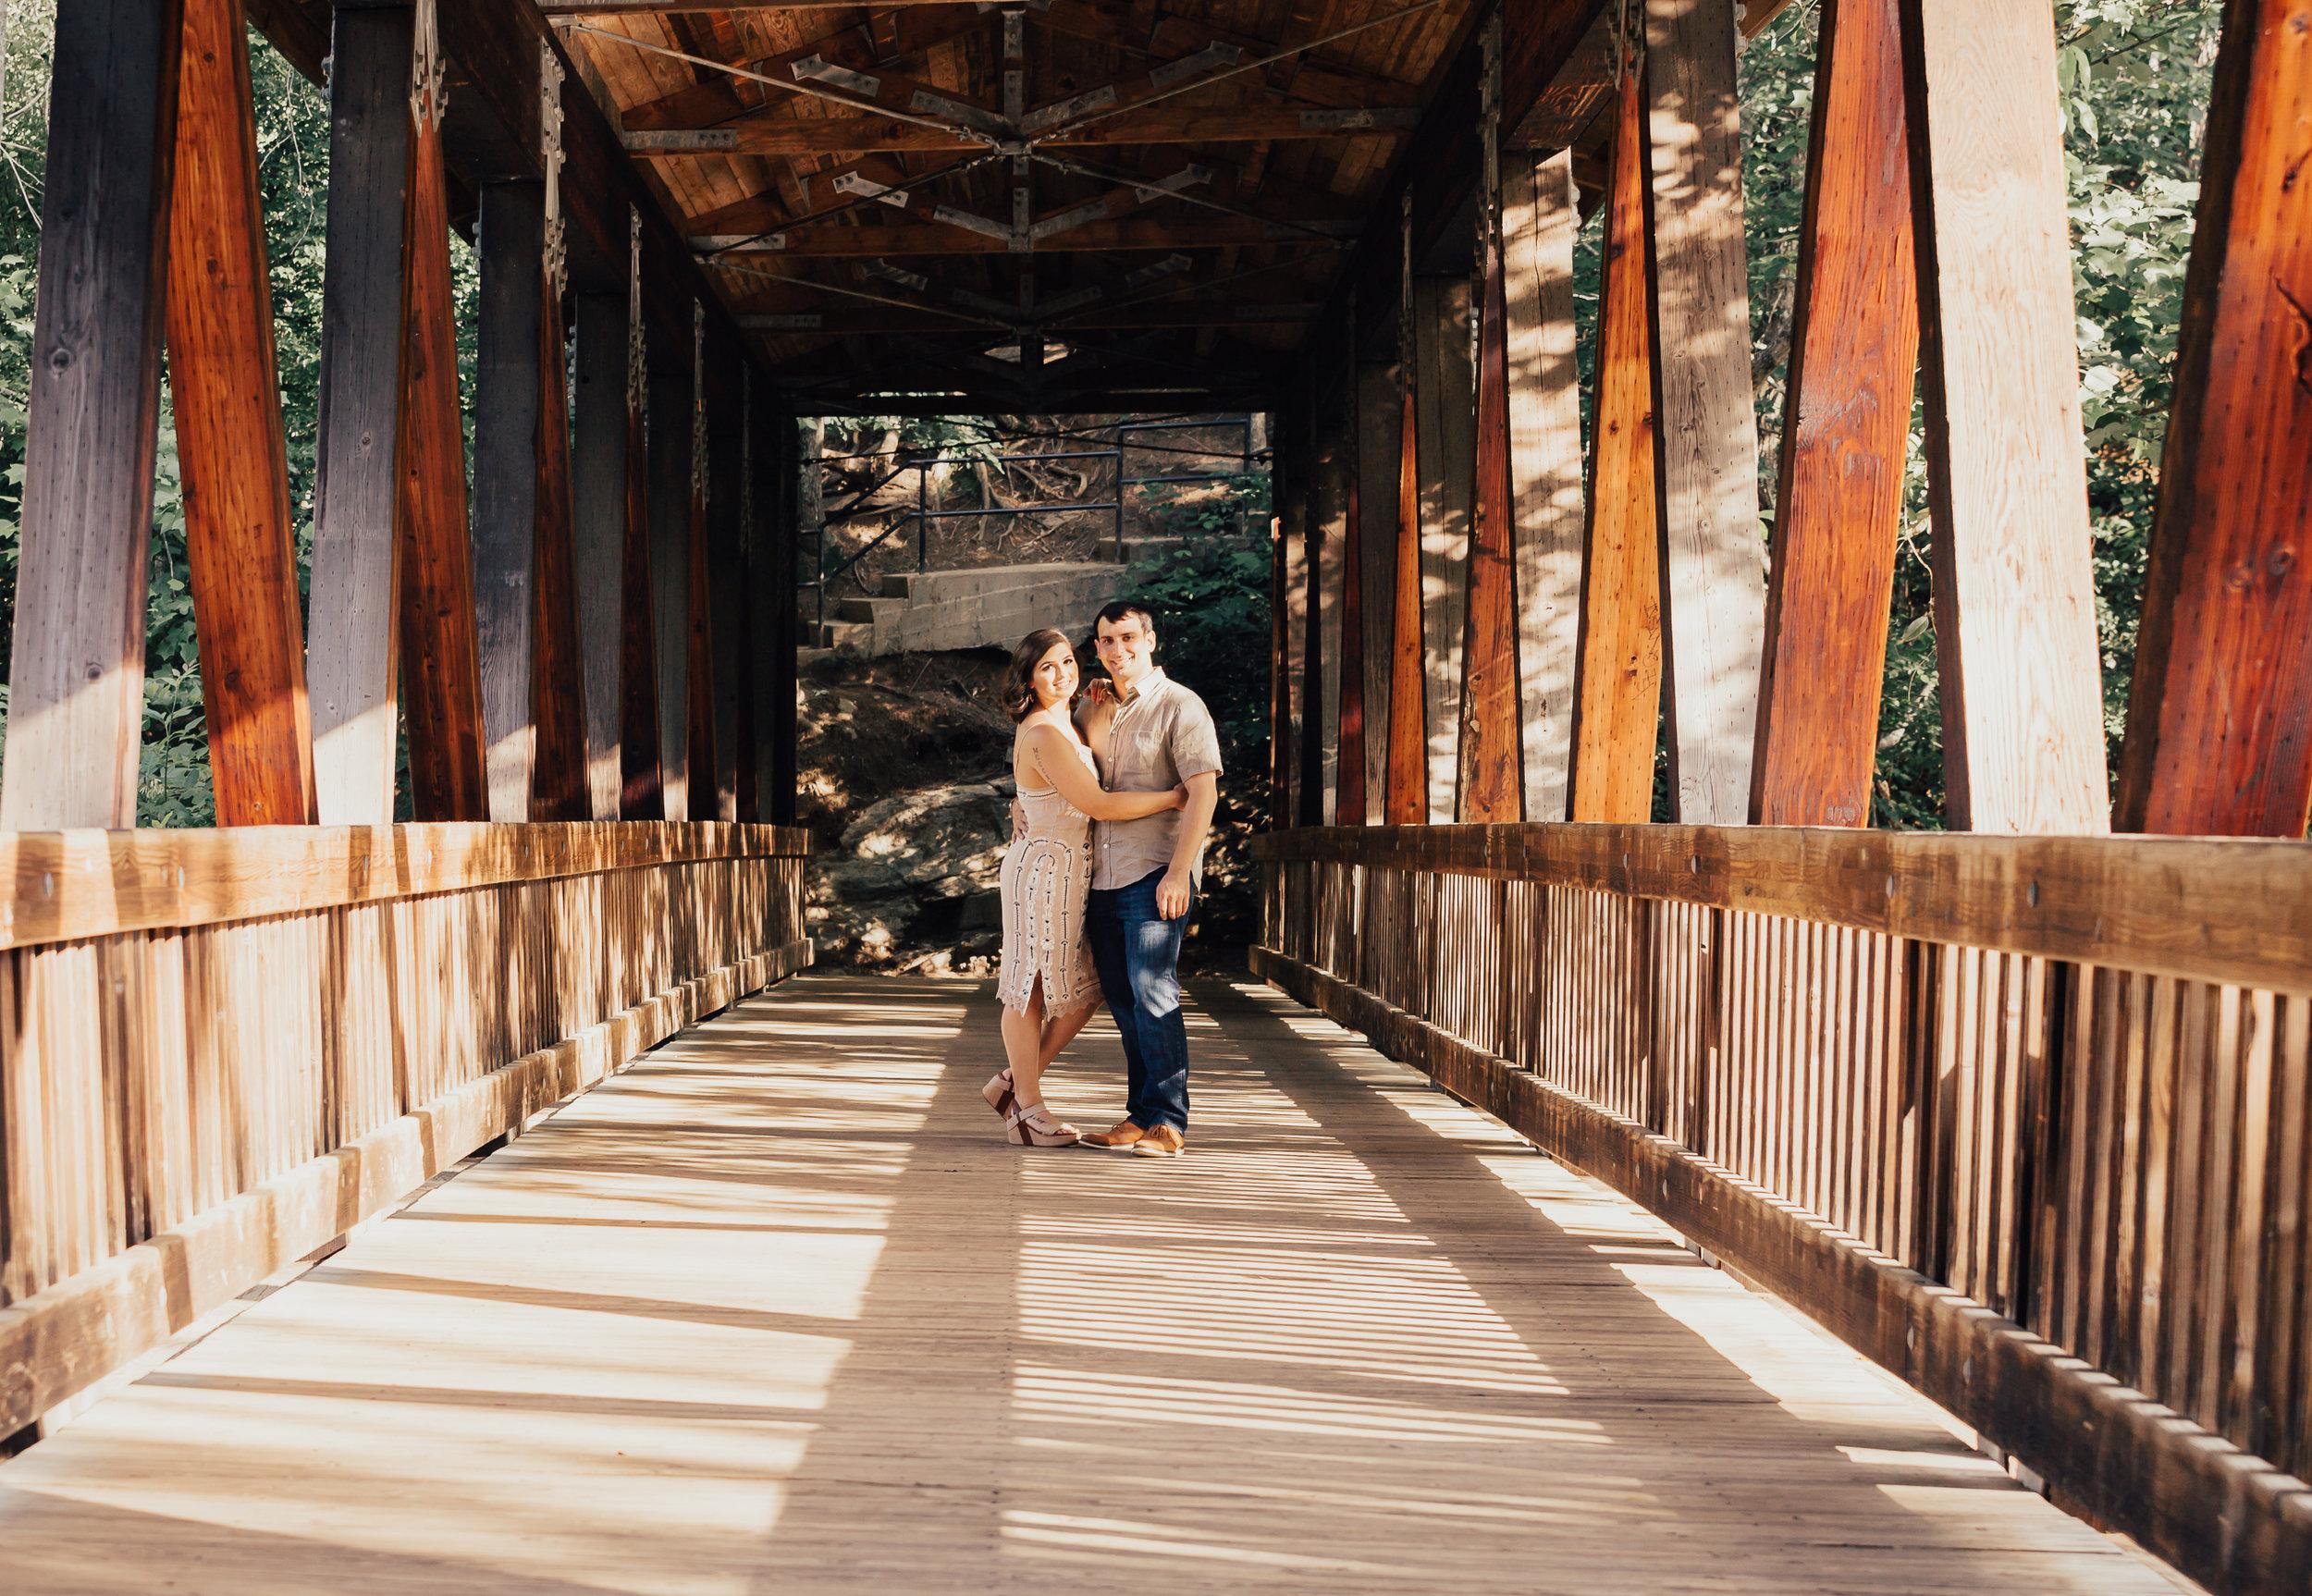 Gianna Keiko Atlanta Roswell Mill Bridge Wedding Engagement Photographer-8.jpg